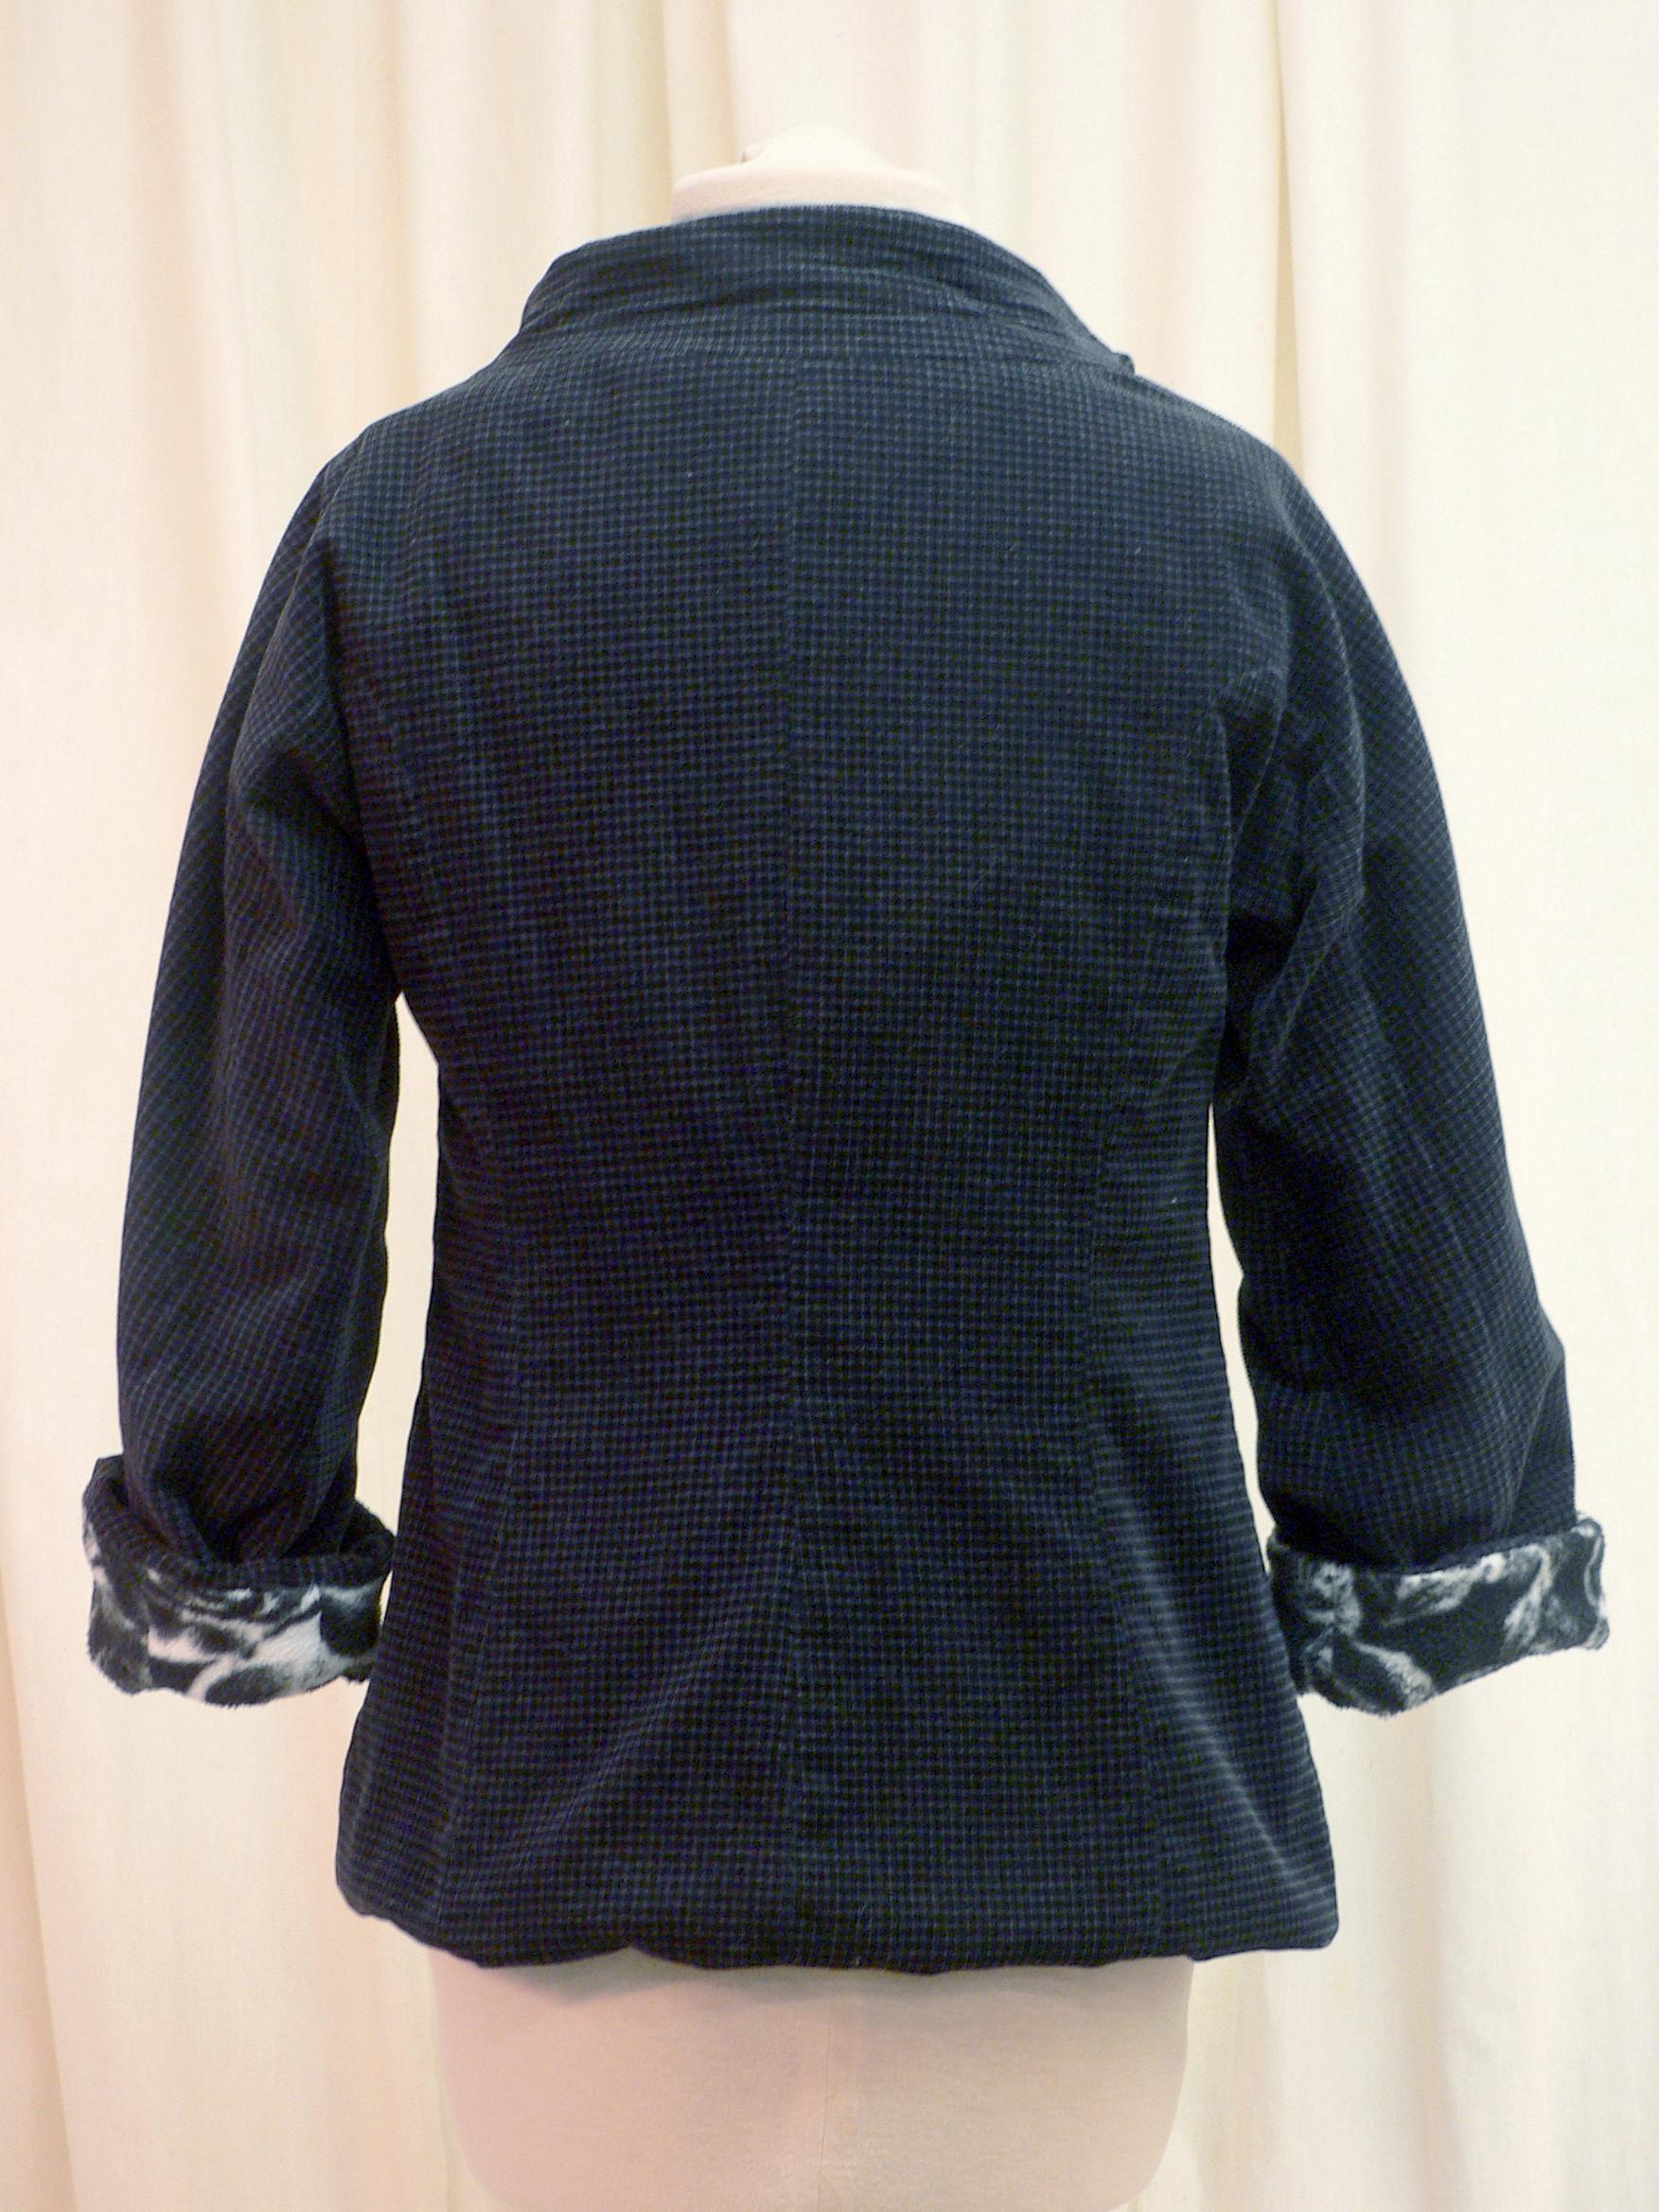 jacket21_back.jpg